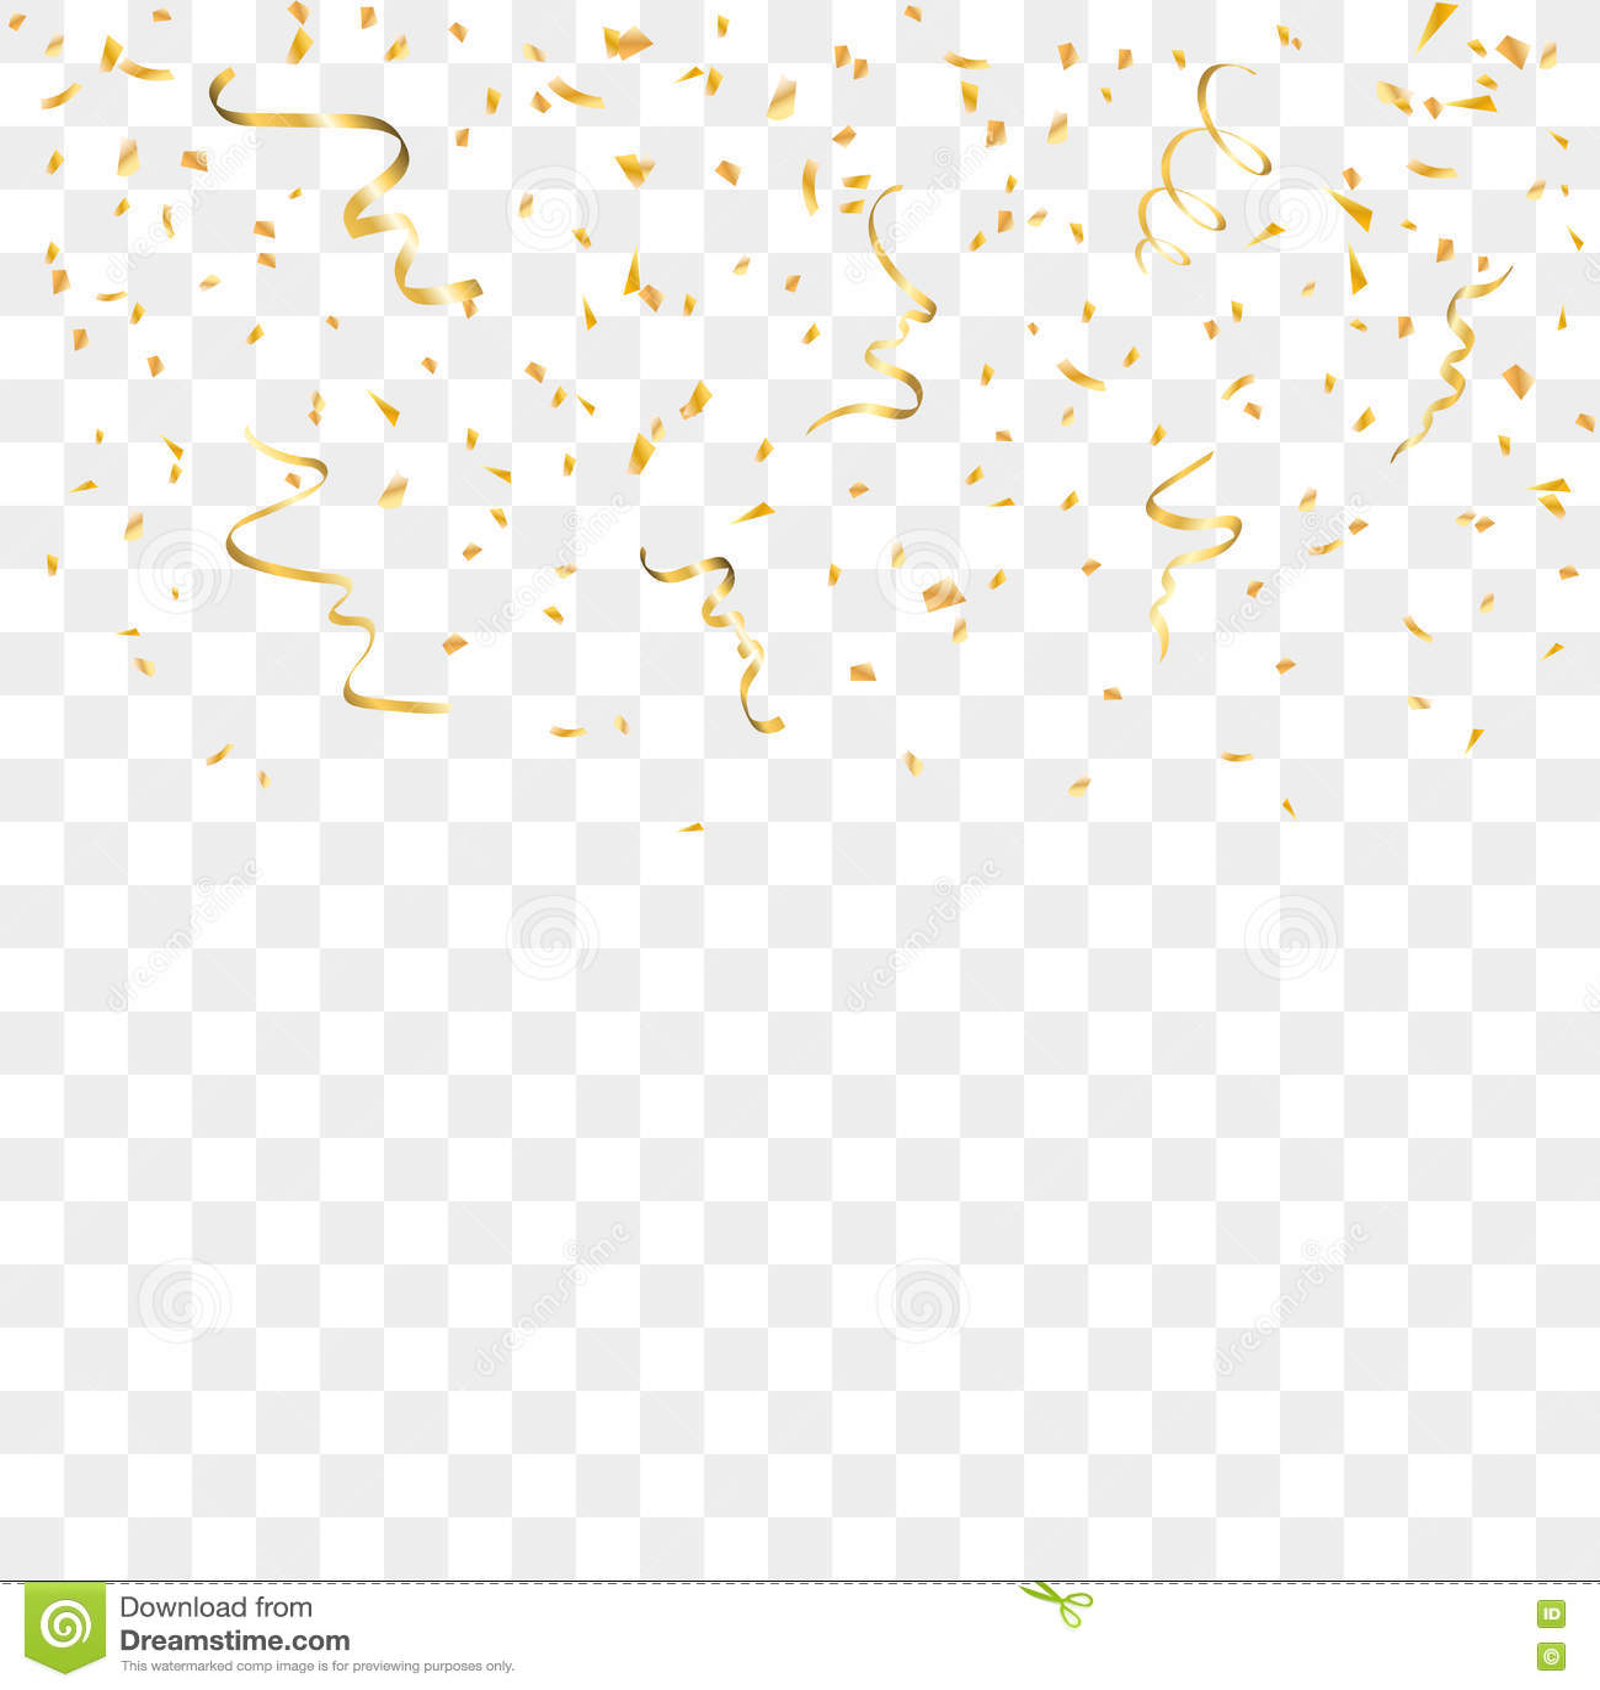 Purple Falling Circles Wallpaper Gold Confetti Background Stock Vector Illustration Of